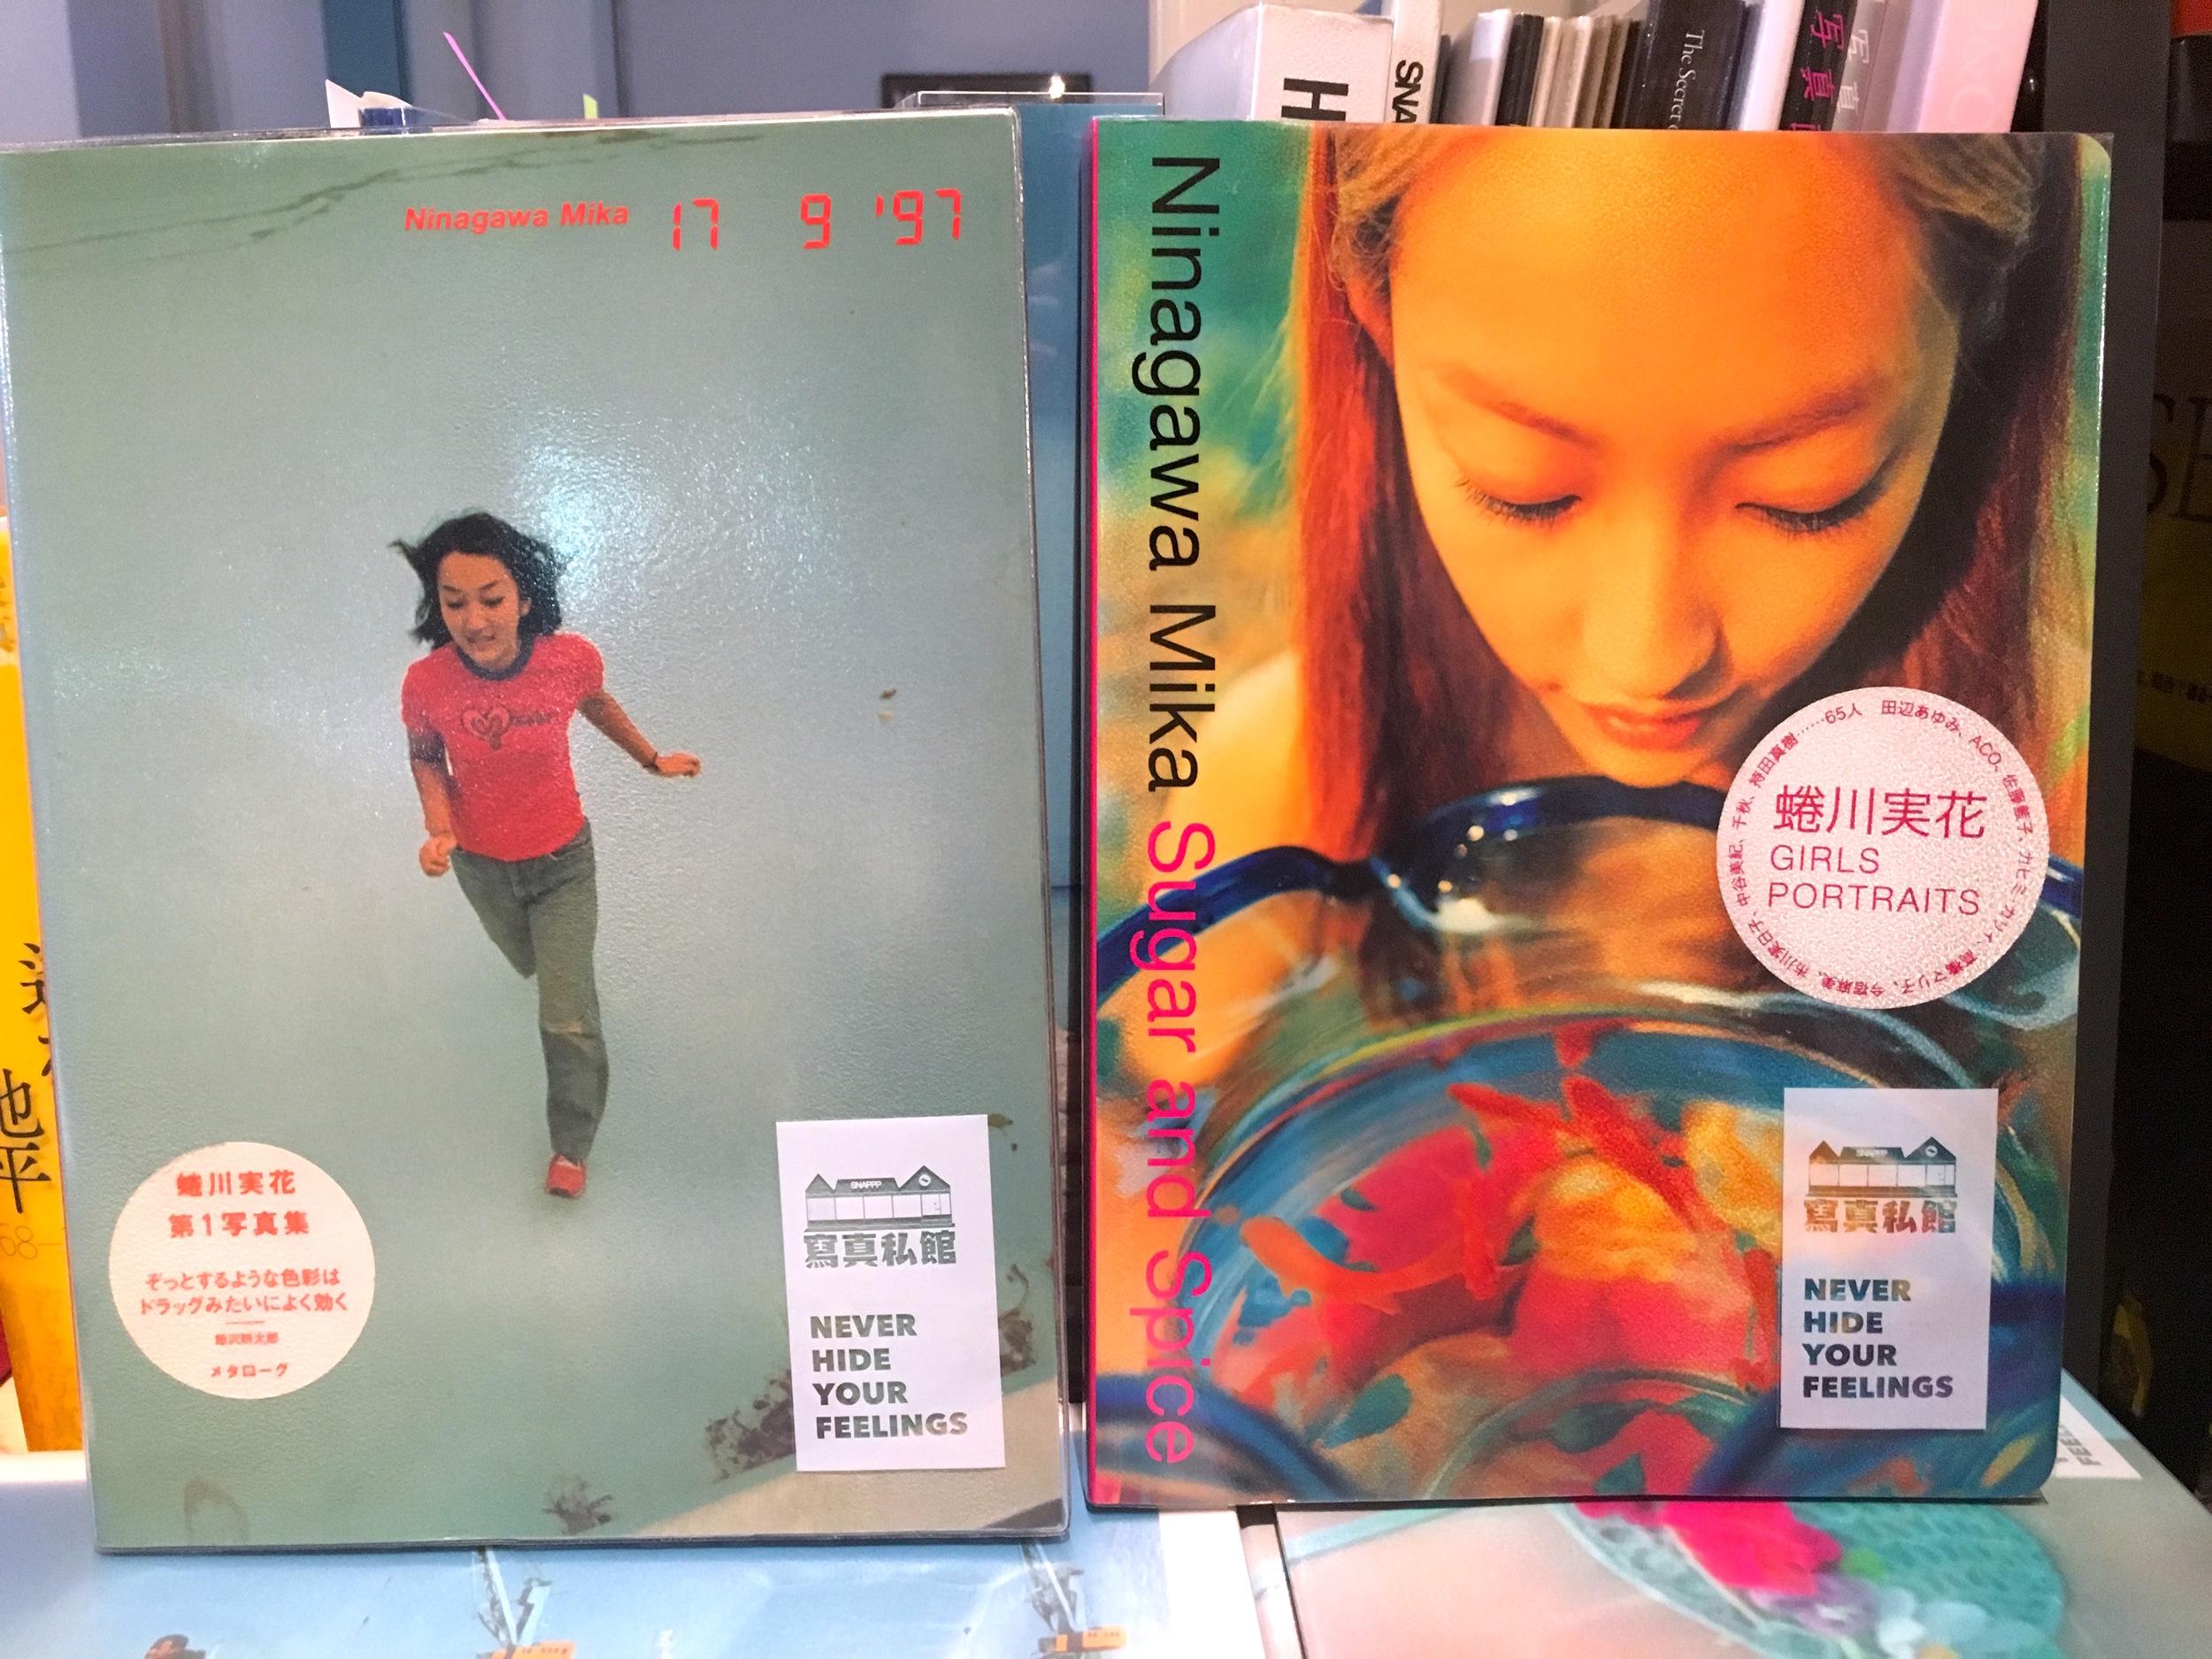 SNAPPP-蜷川實花 MIKA NINAGAWA